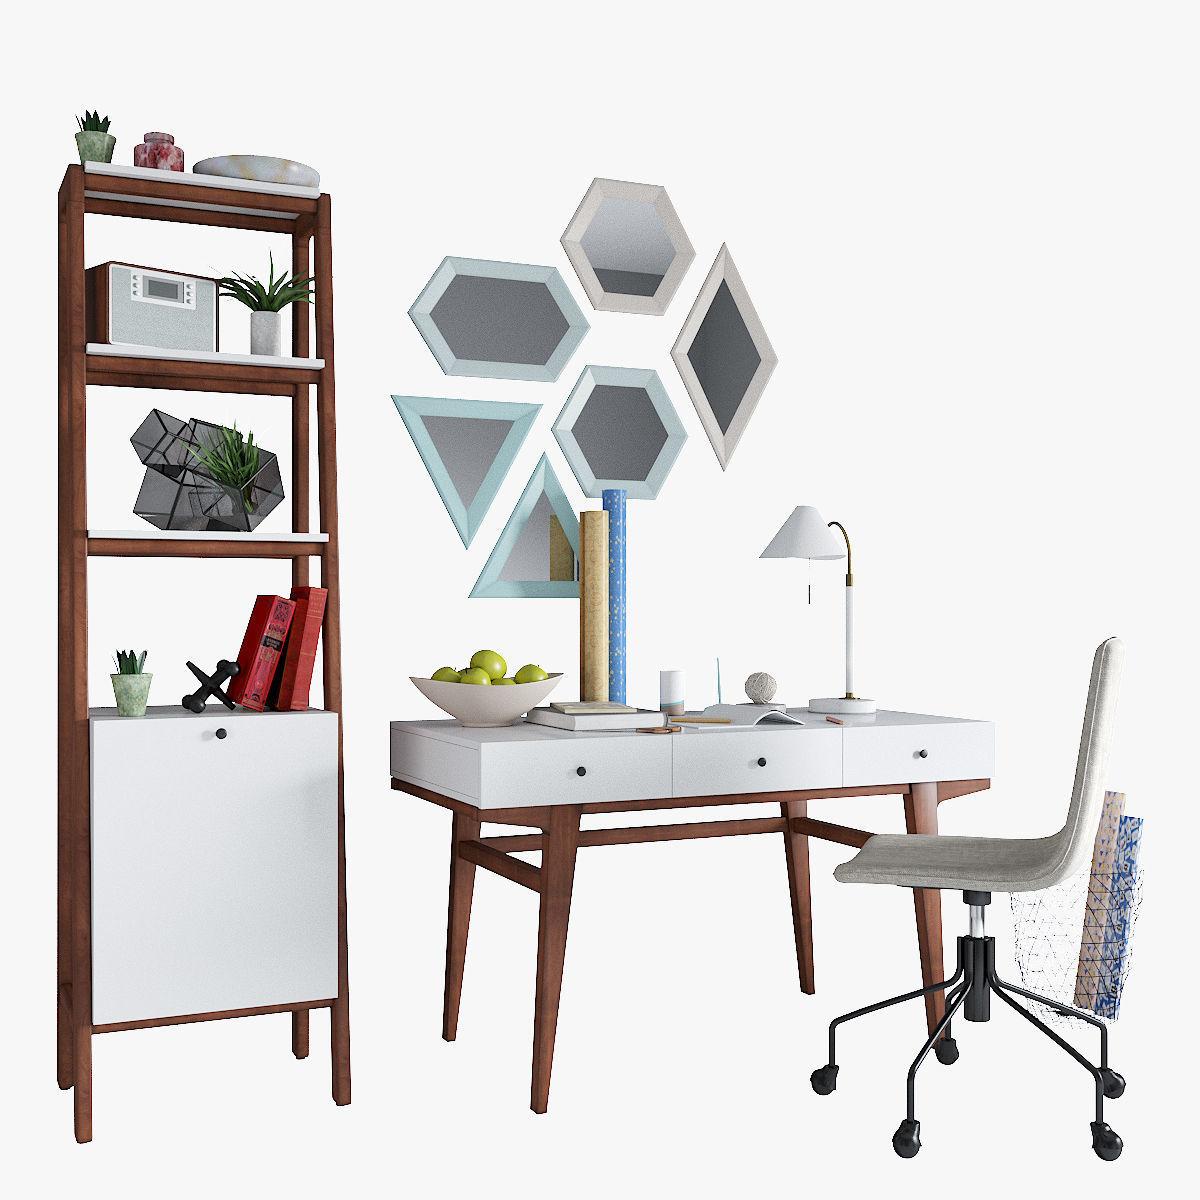 West Elm Modern Desk Narrow Tower Slope Office Chair  40D model